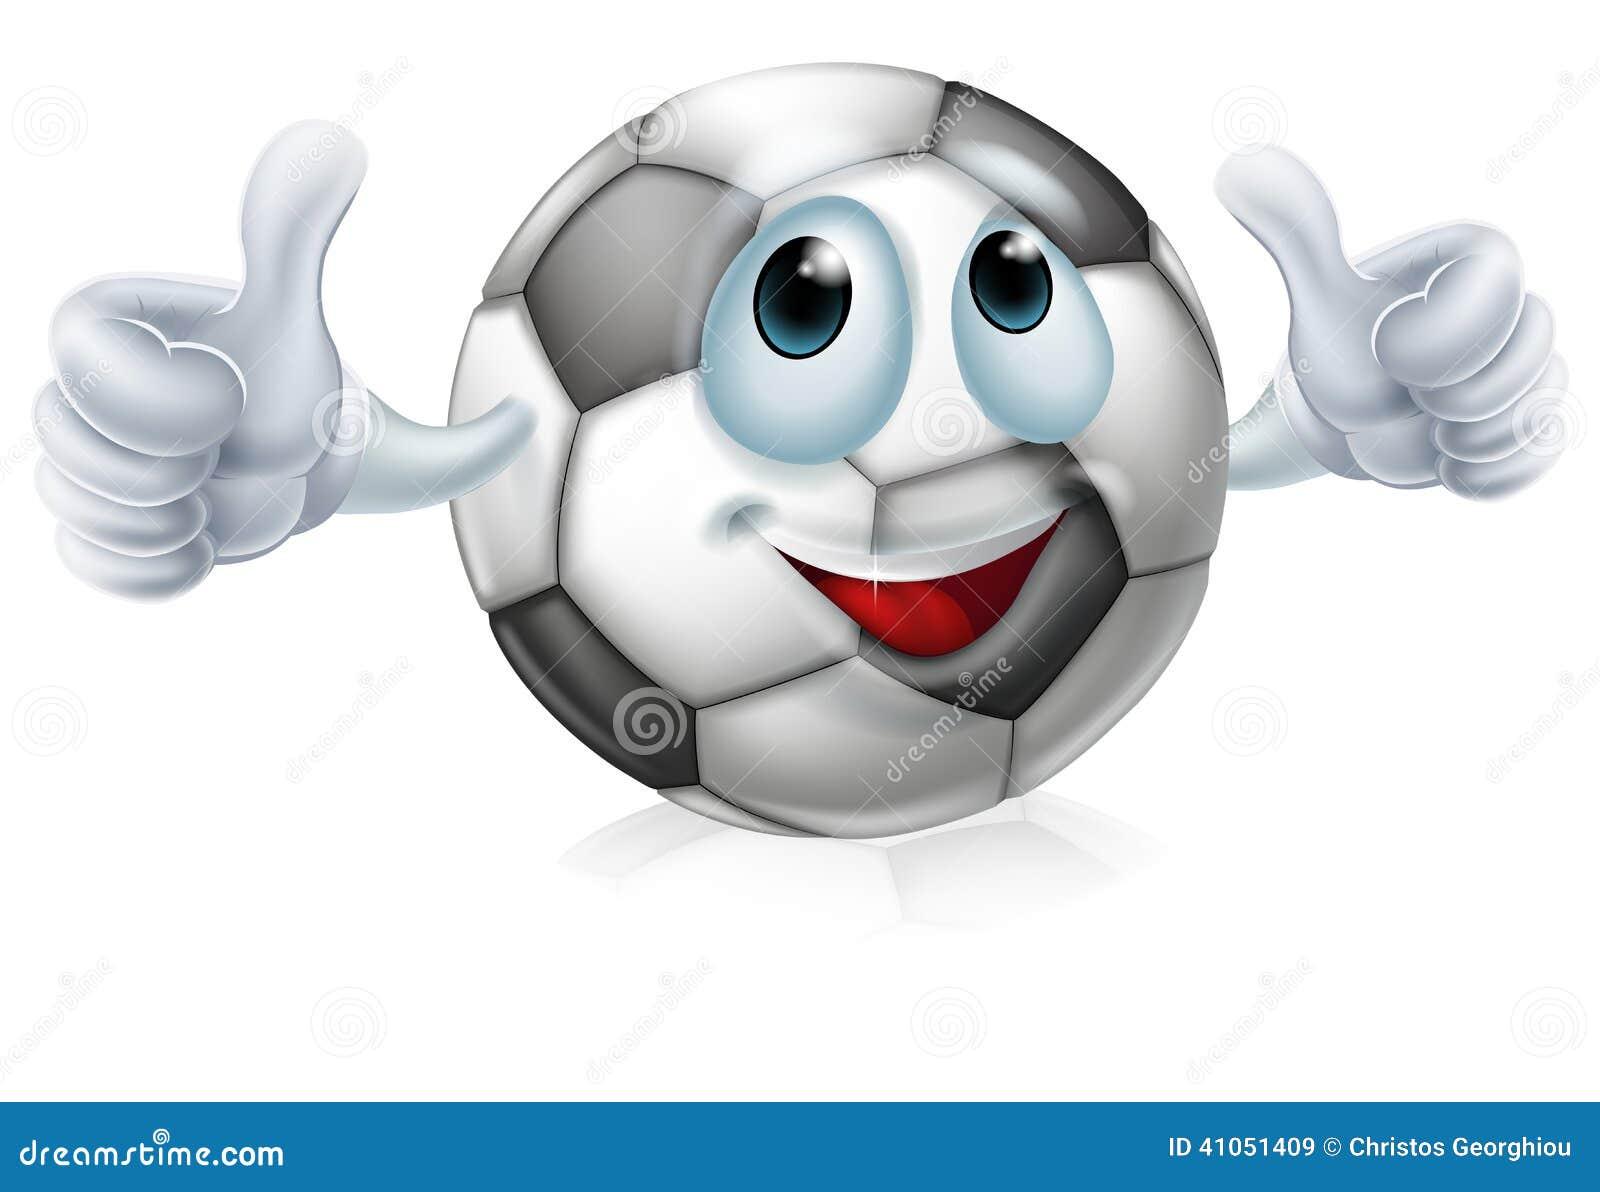 Cartoon Soccer Ball Character Stock Vector - Image: 41051409